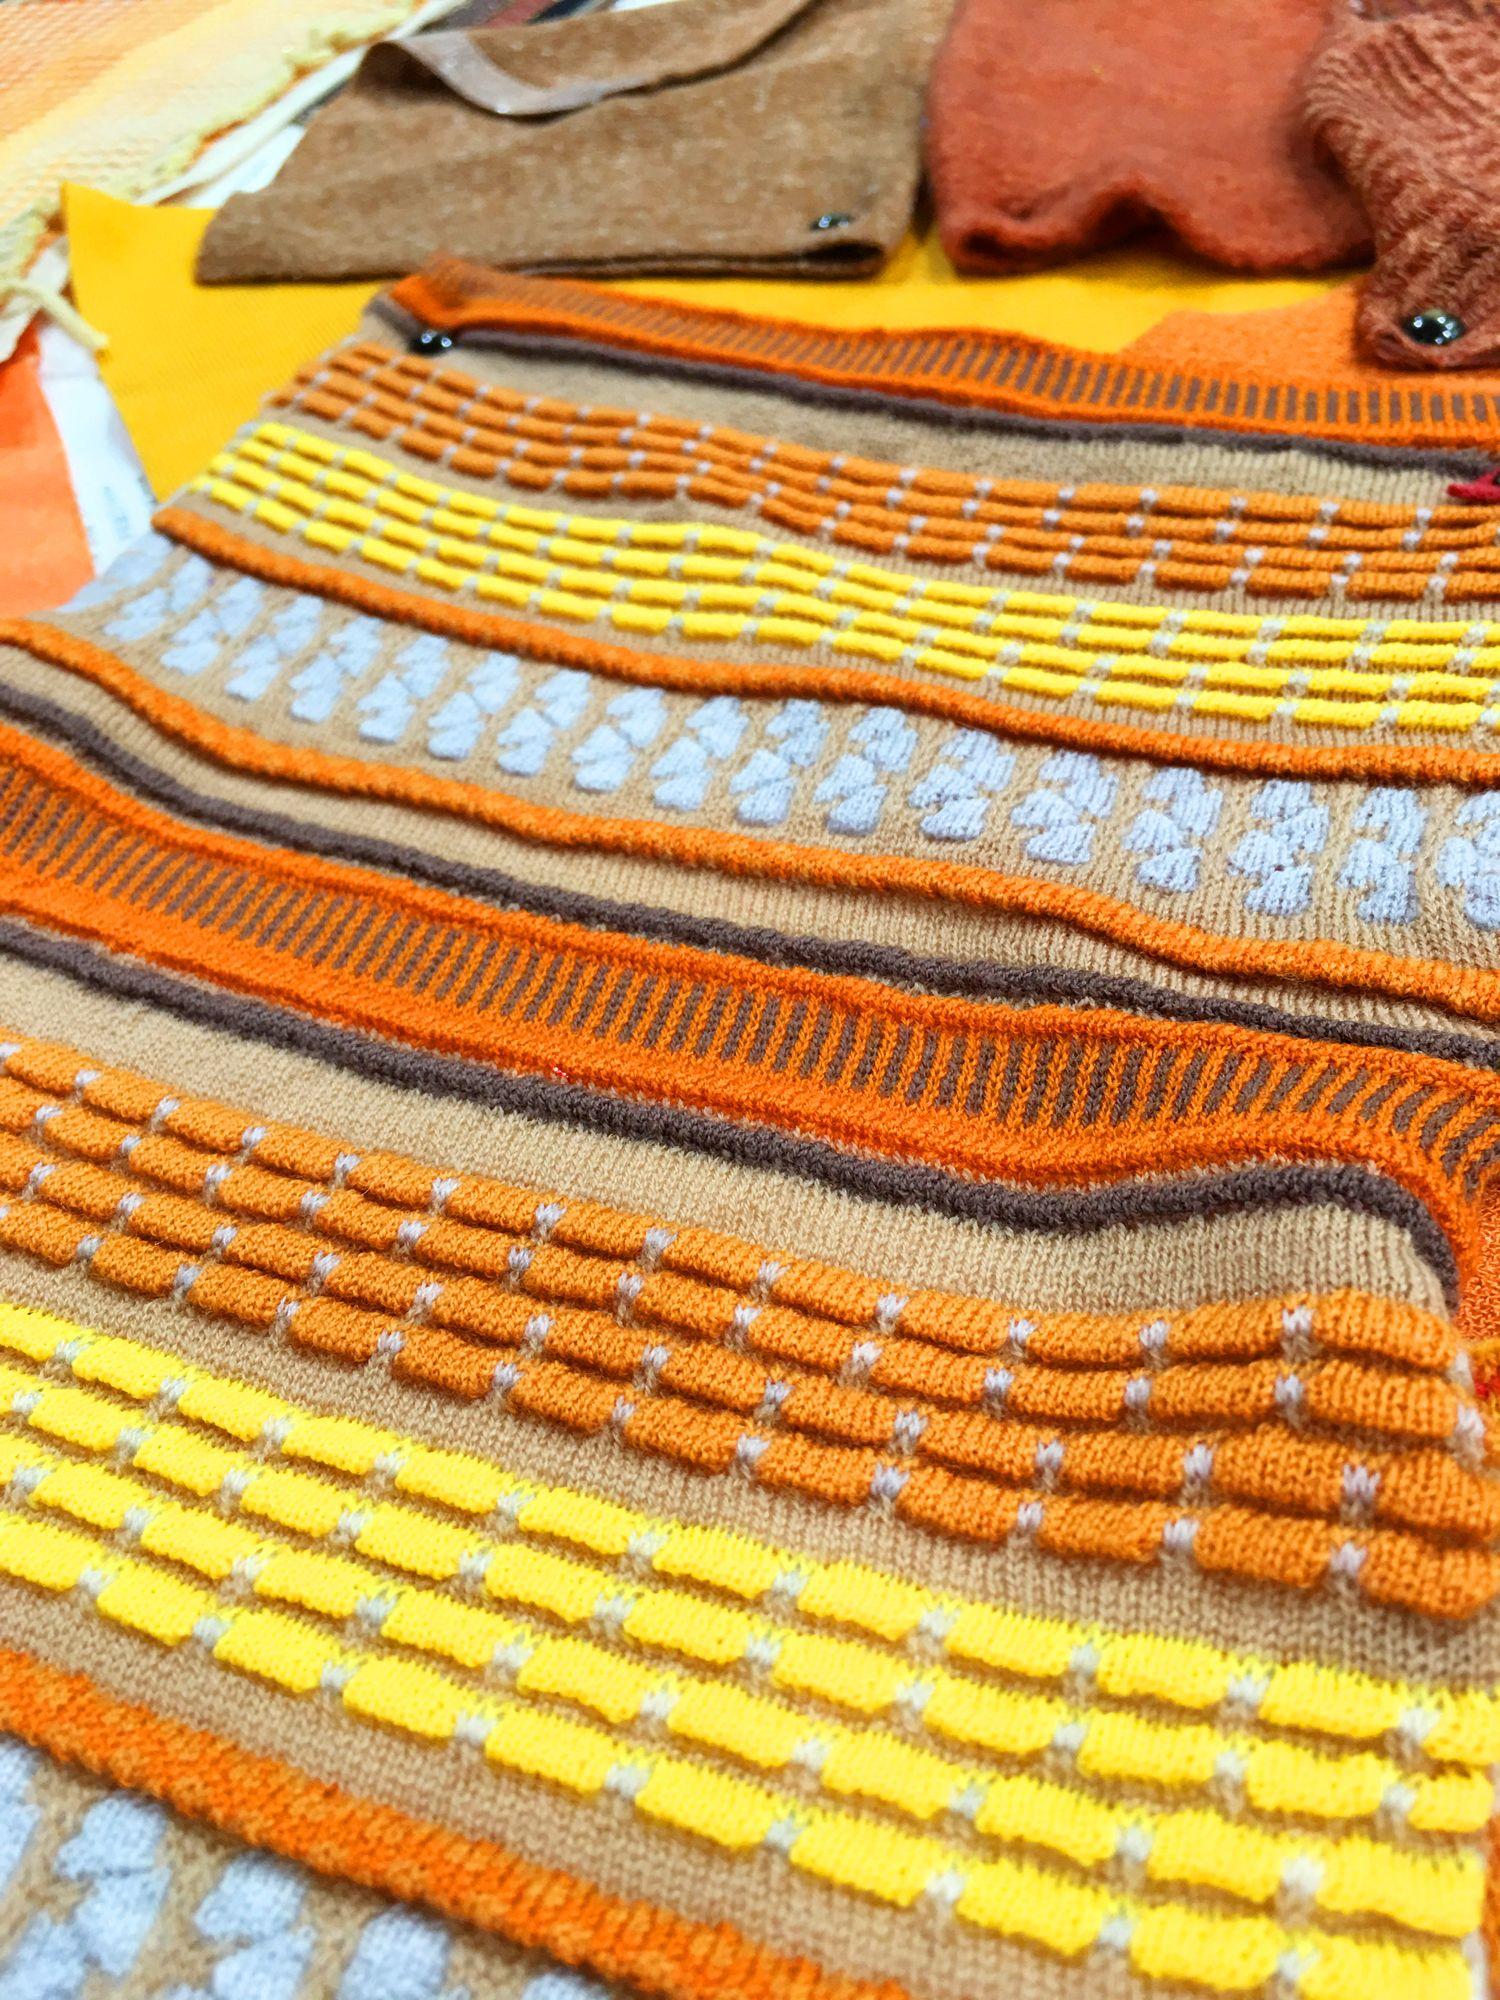 Pin de Navya Cherukuru en Knitwear | Pinterest | Máquina de tejer ...